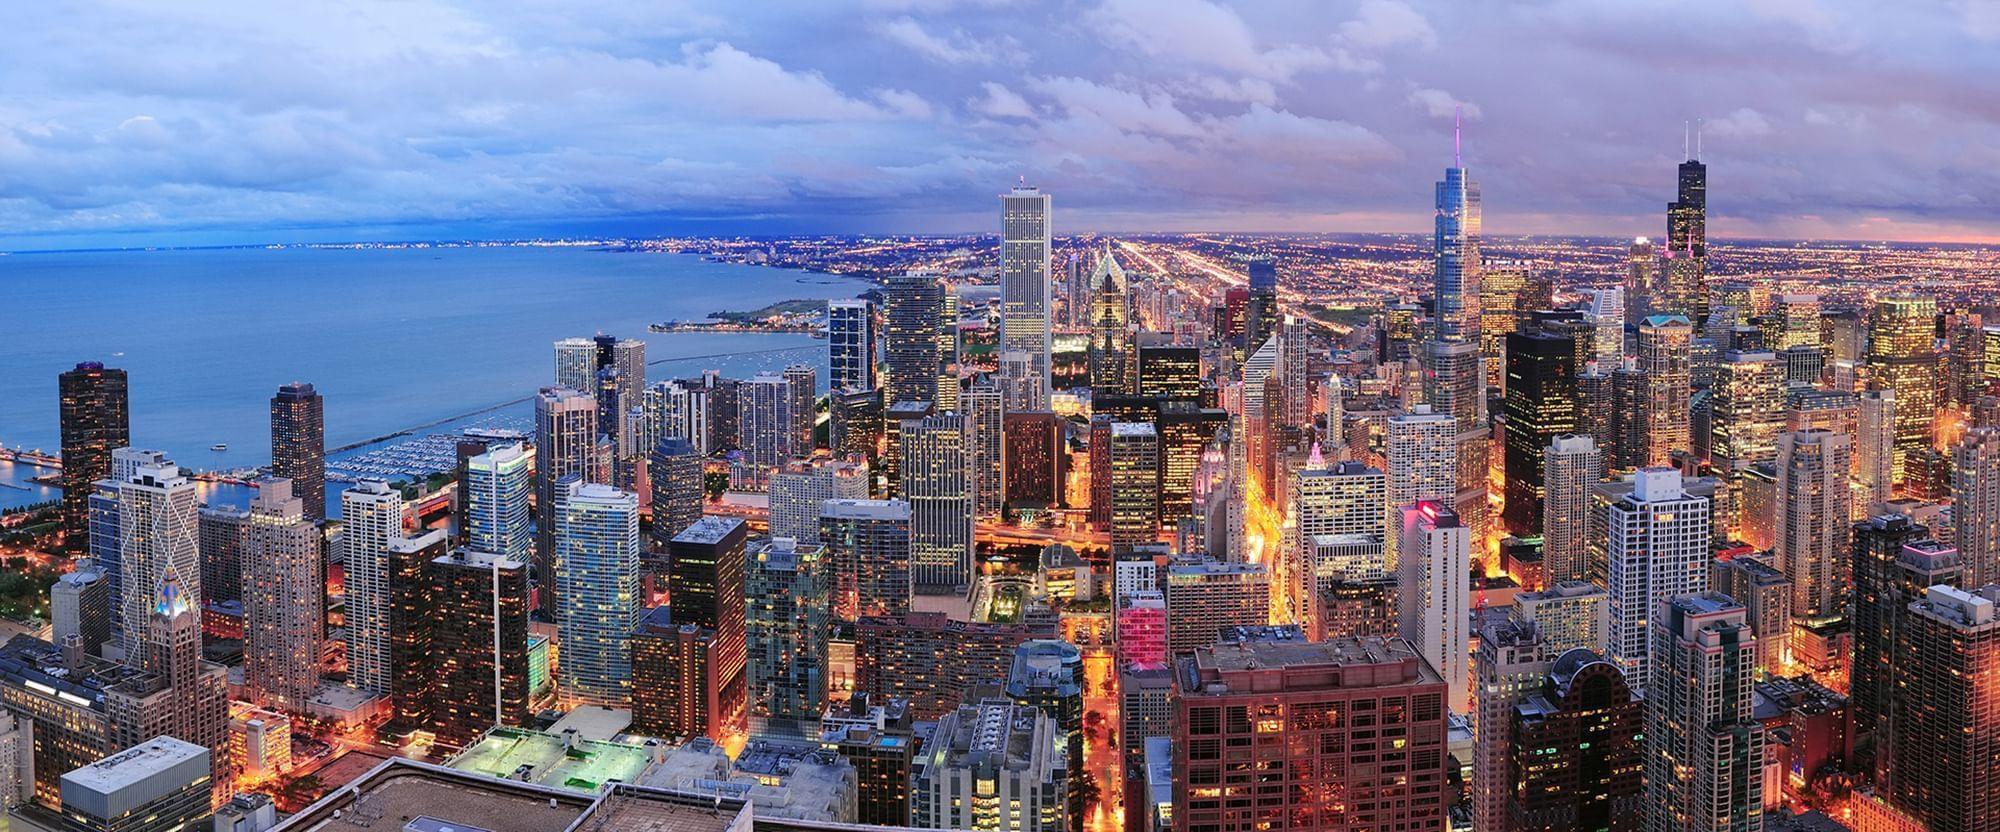 شيكاغو - مشهد بانورامي عند الغسق